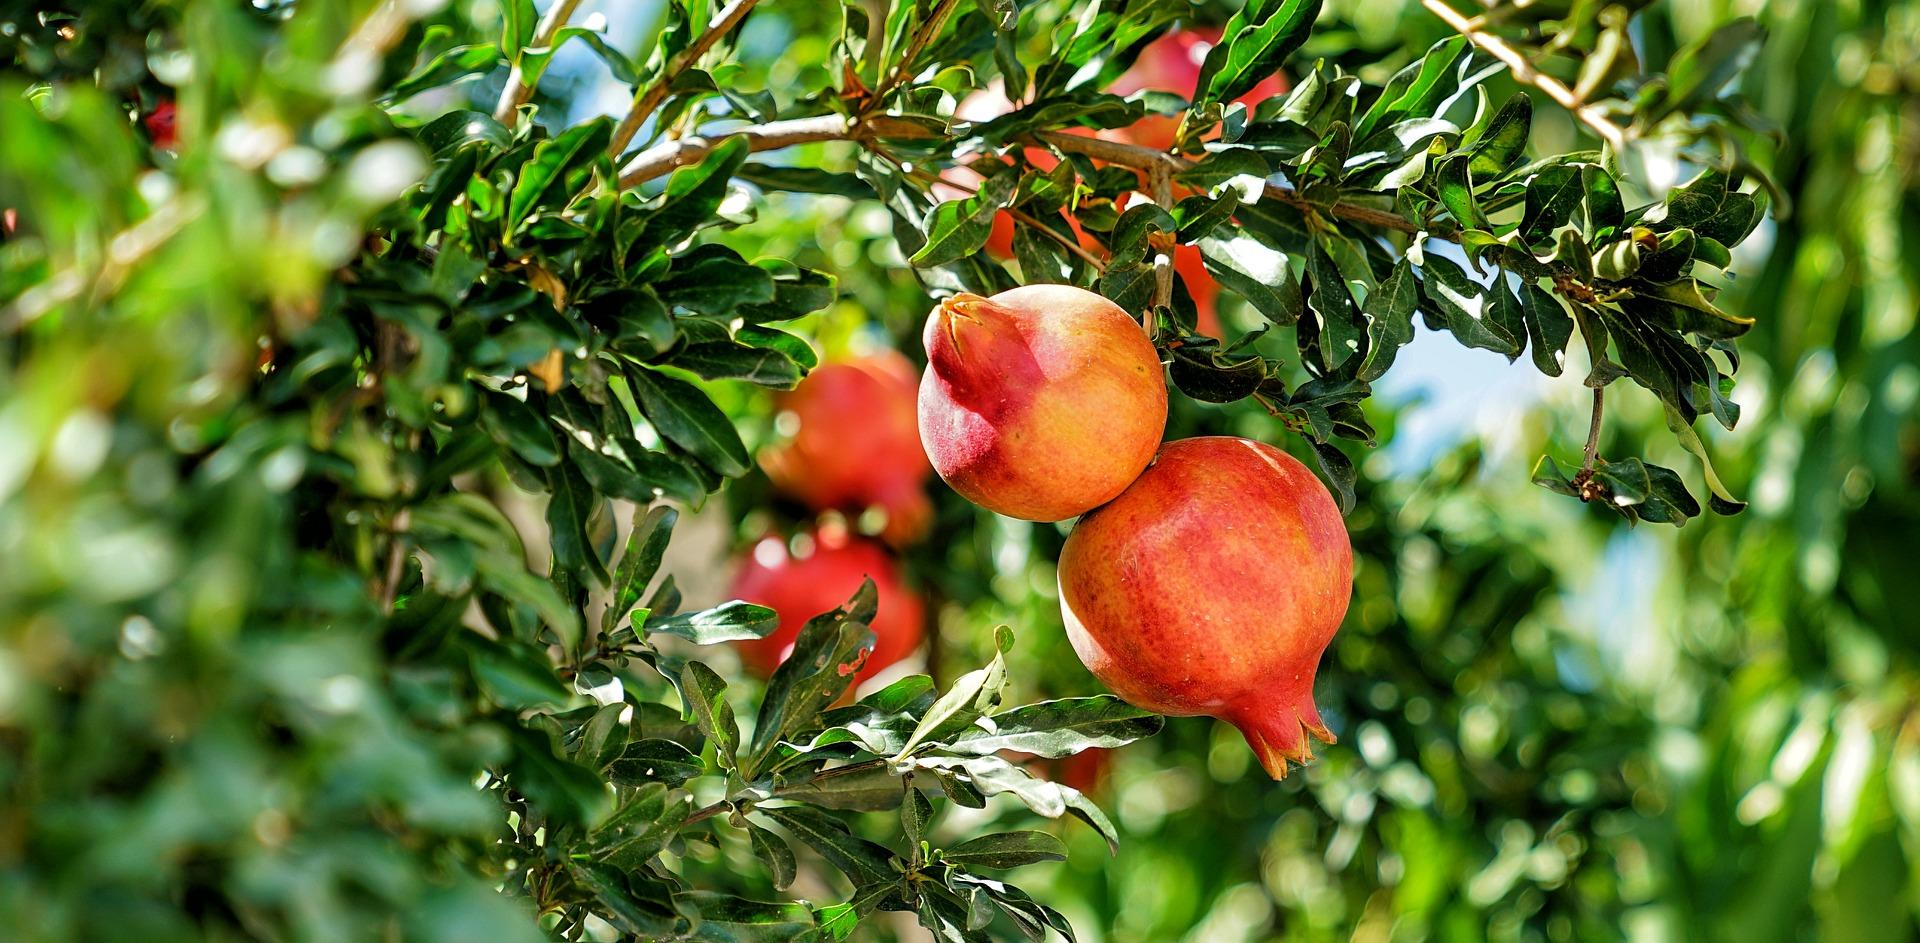 pomegranate-2825556_1920.jpg